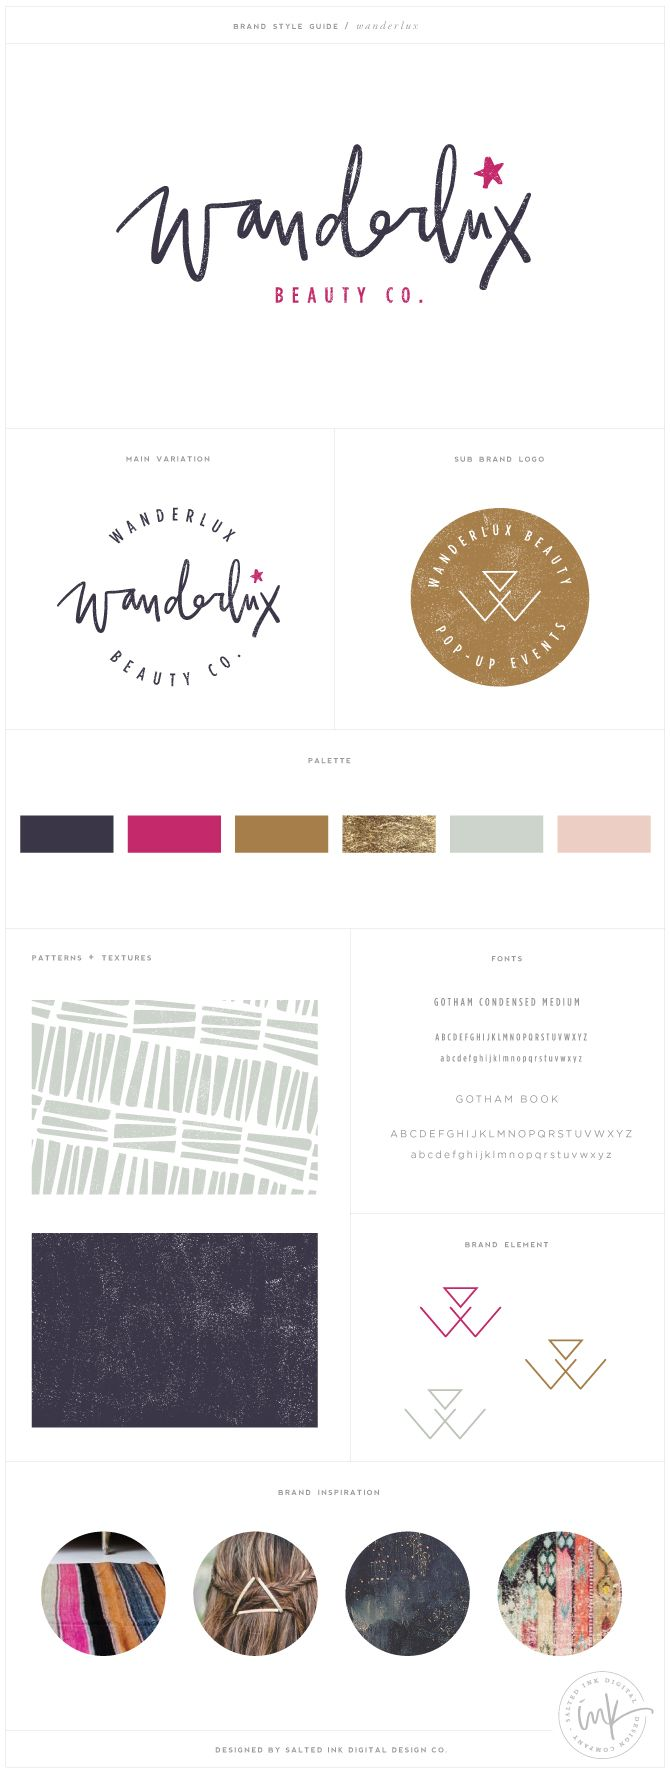 Designer deals club for hancock - Wanderlux Beauty Co Brand Design By Salted Ink Brand Stylist And Website Designer View